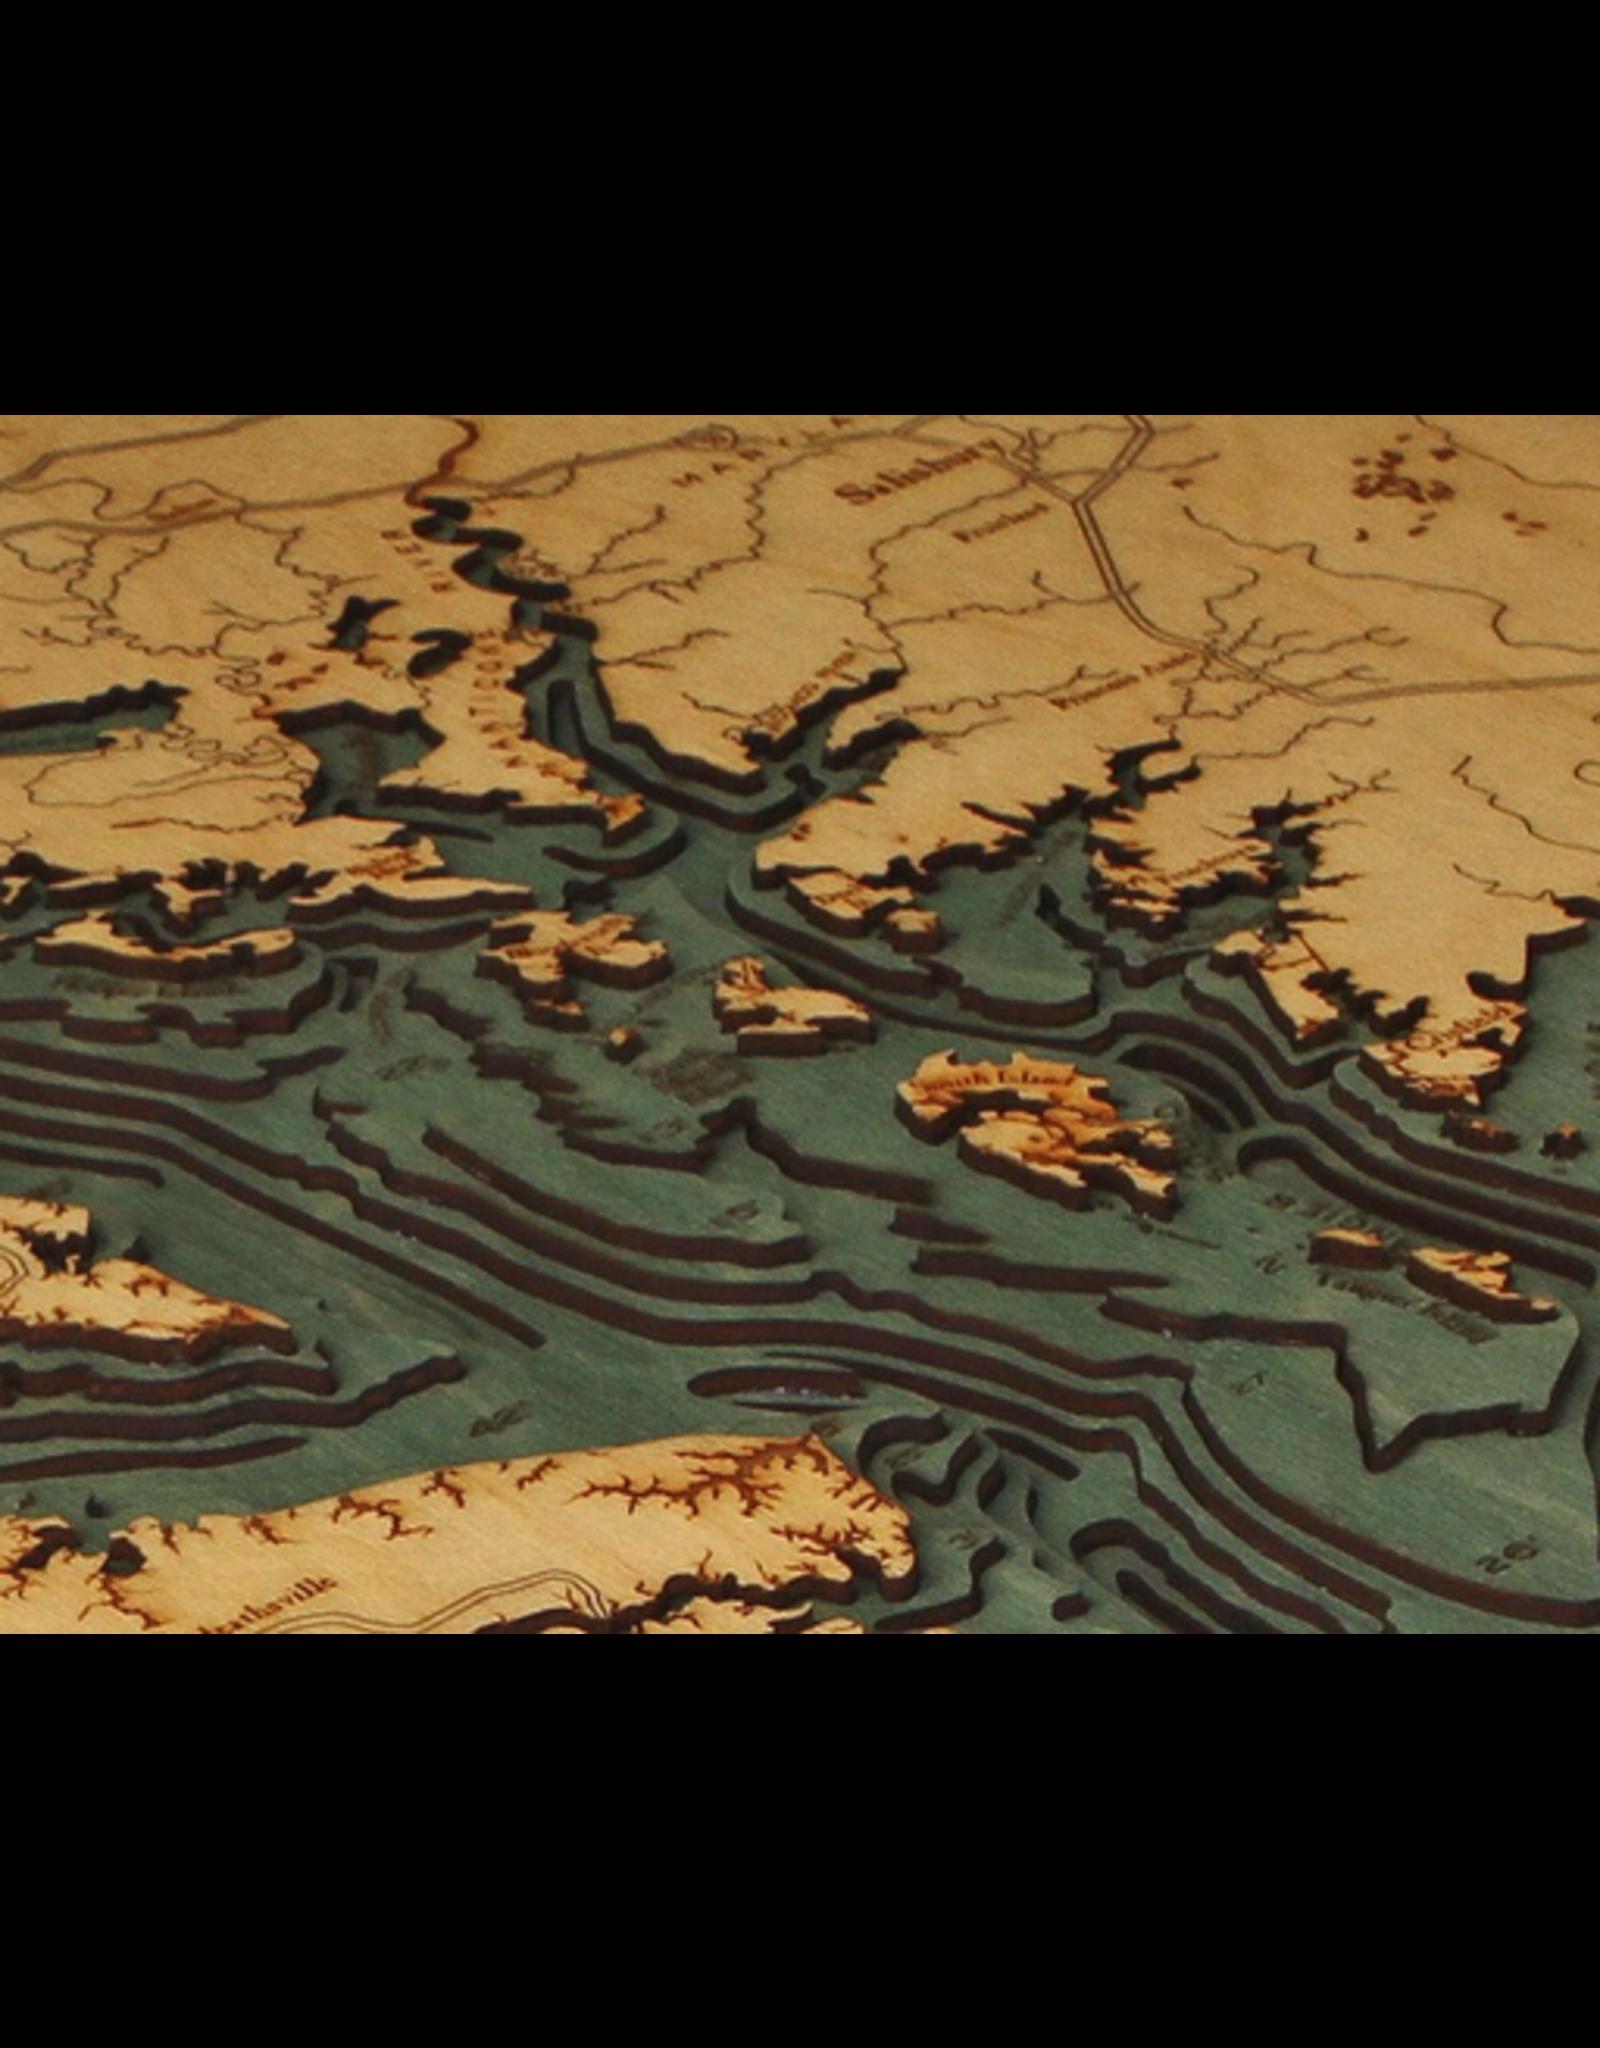 WoodCharts Chesapeake Bay (Bathymetric 3-D Wood Carved Nautical Chart)